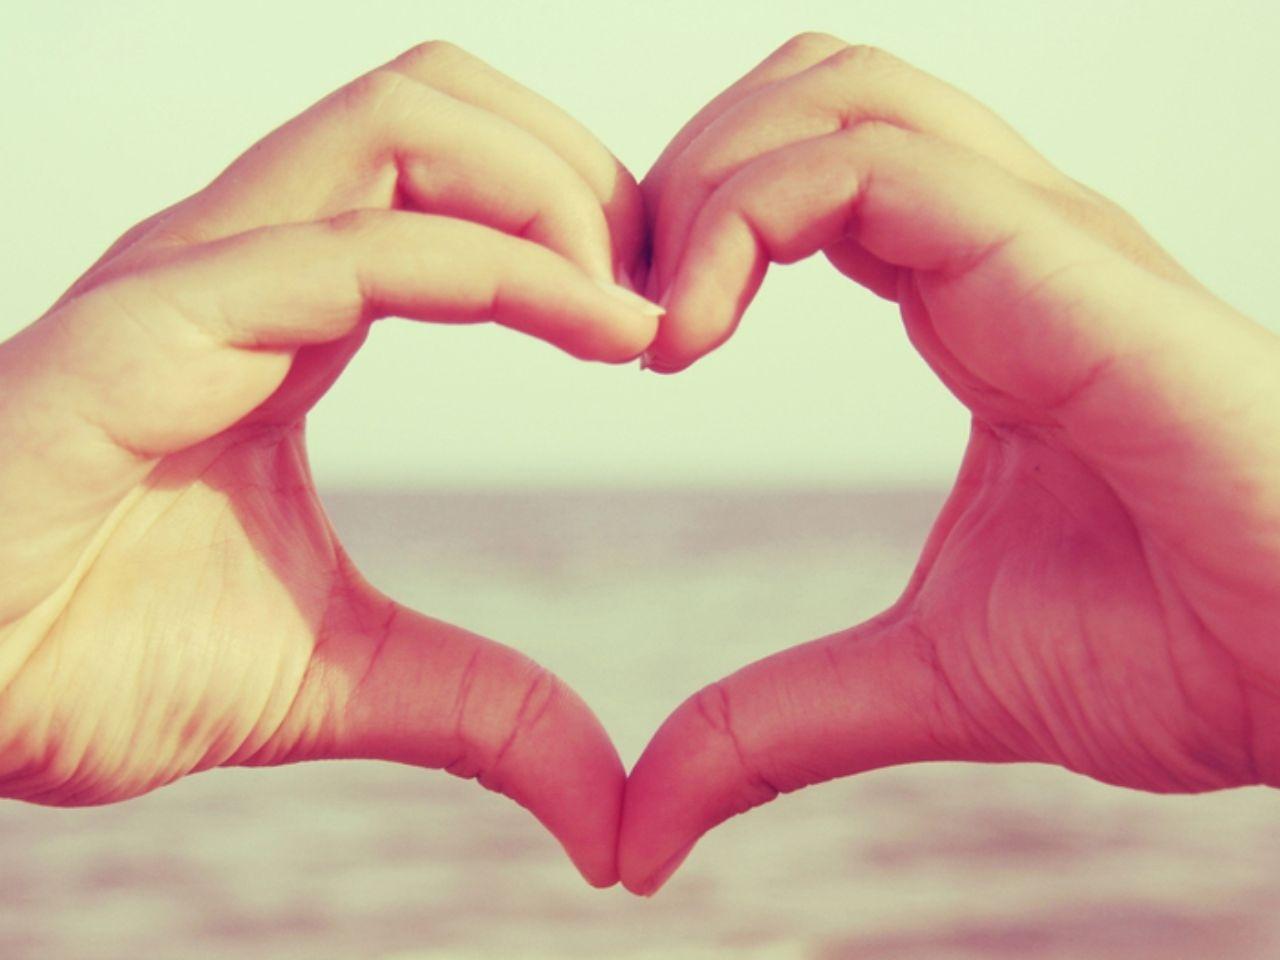 Hd wallpapers hands heart desktop wallpaper - 2 hand love wallpaper ...